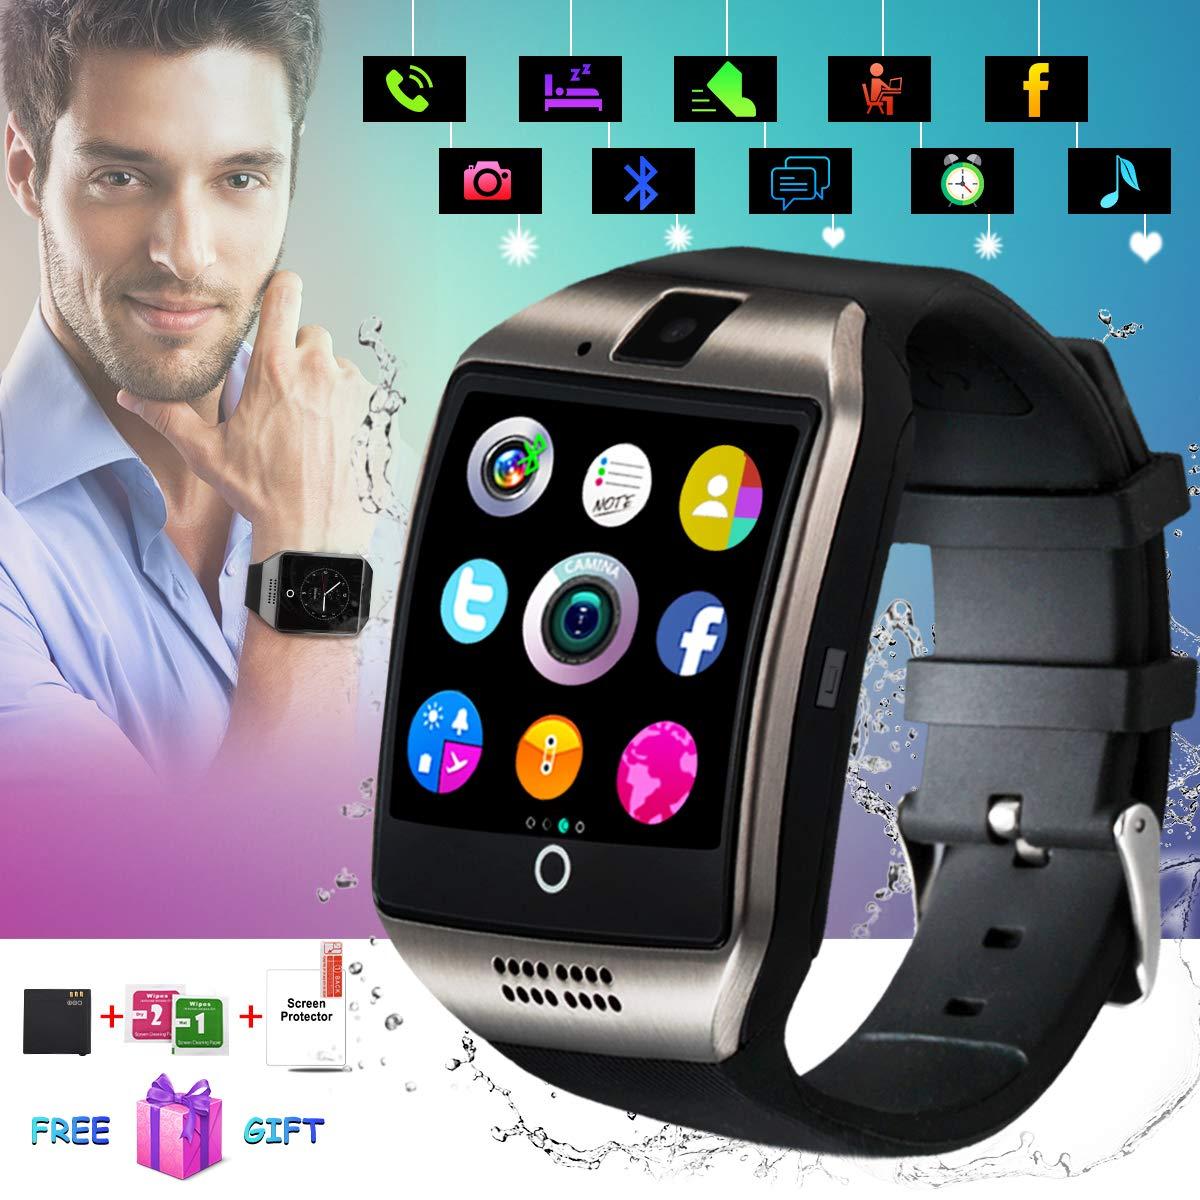 Bluetooth Smartwatch con Camera,Smart Watch Phone Touchscreen,Smart Orologio,Impermeabile Orologio Intelligente con SIM Card Fessura per Android Samsung Huawei ios iphone X 8 7 6 6s 5 Uomo Men Donna product image